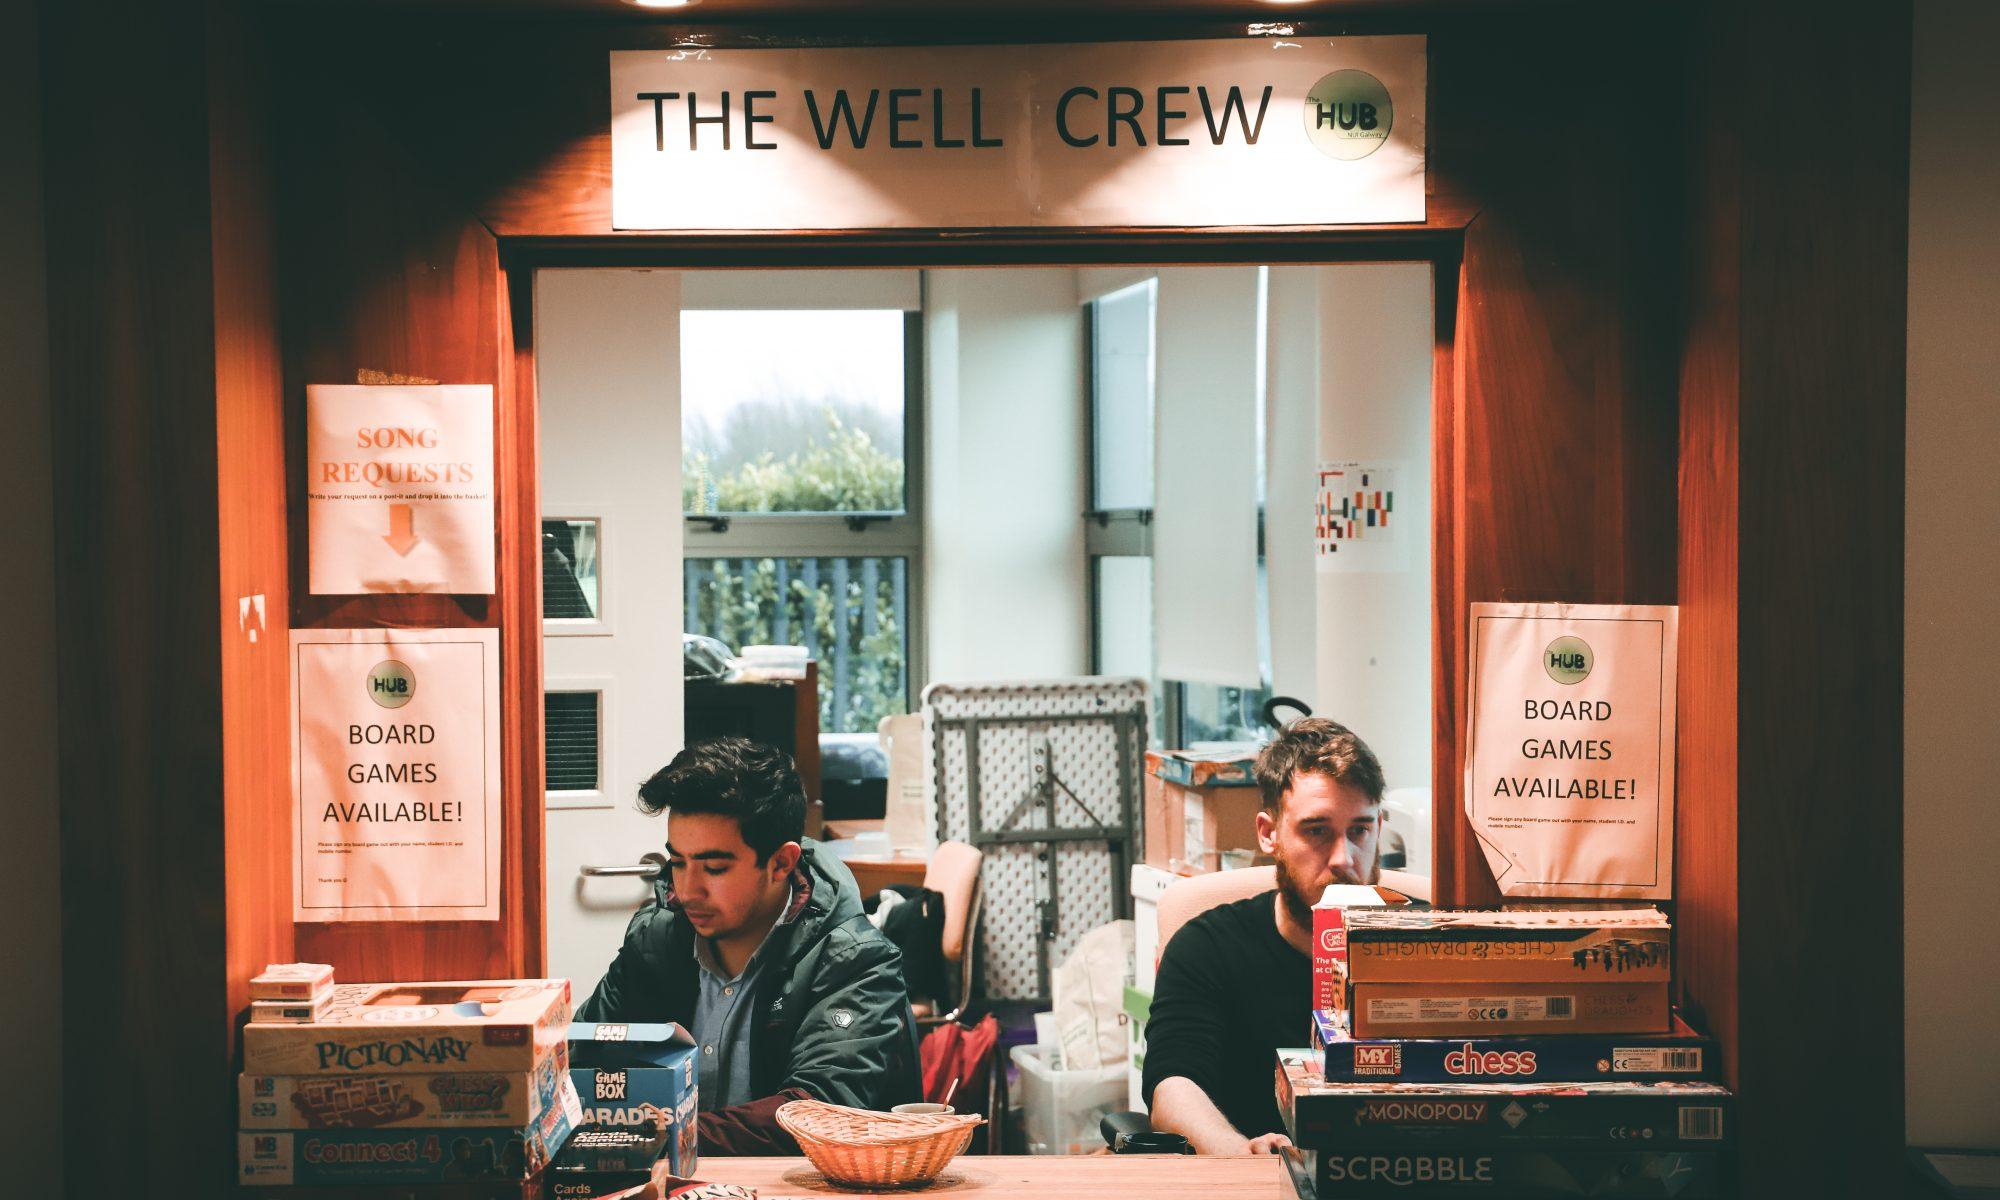 The Hub @ NUI Galway